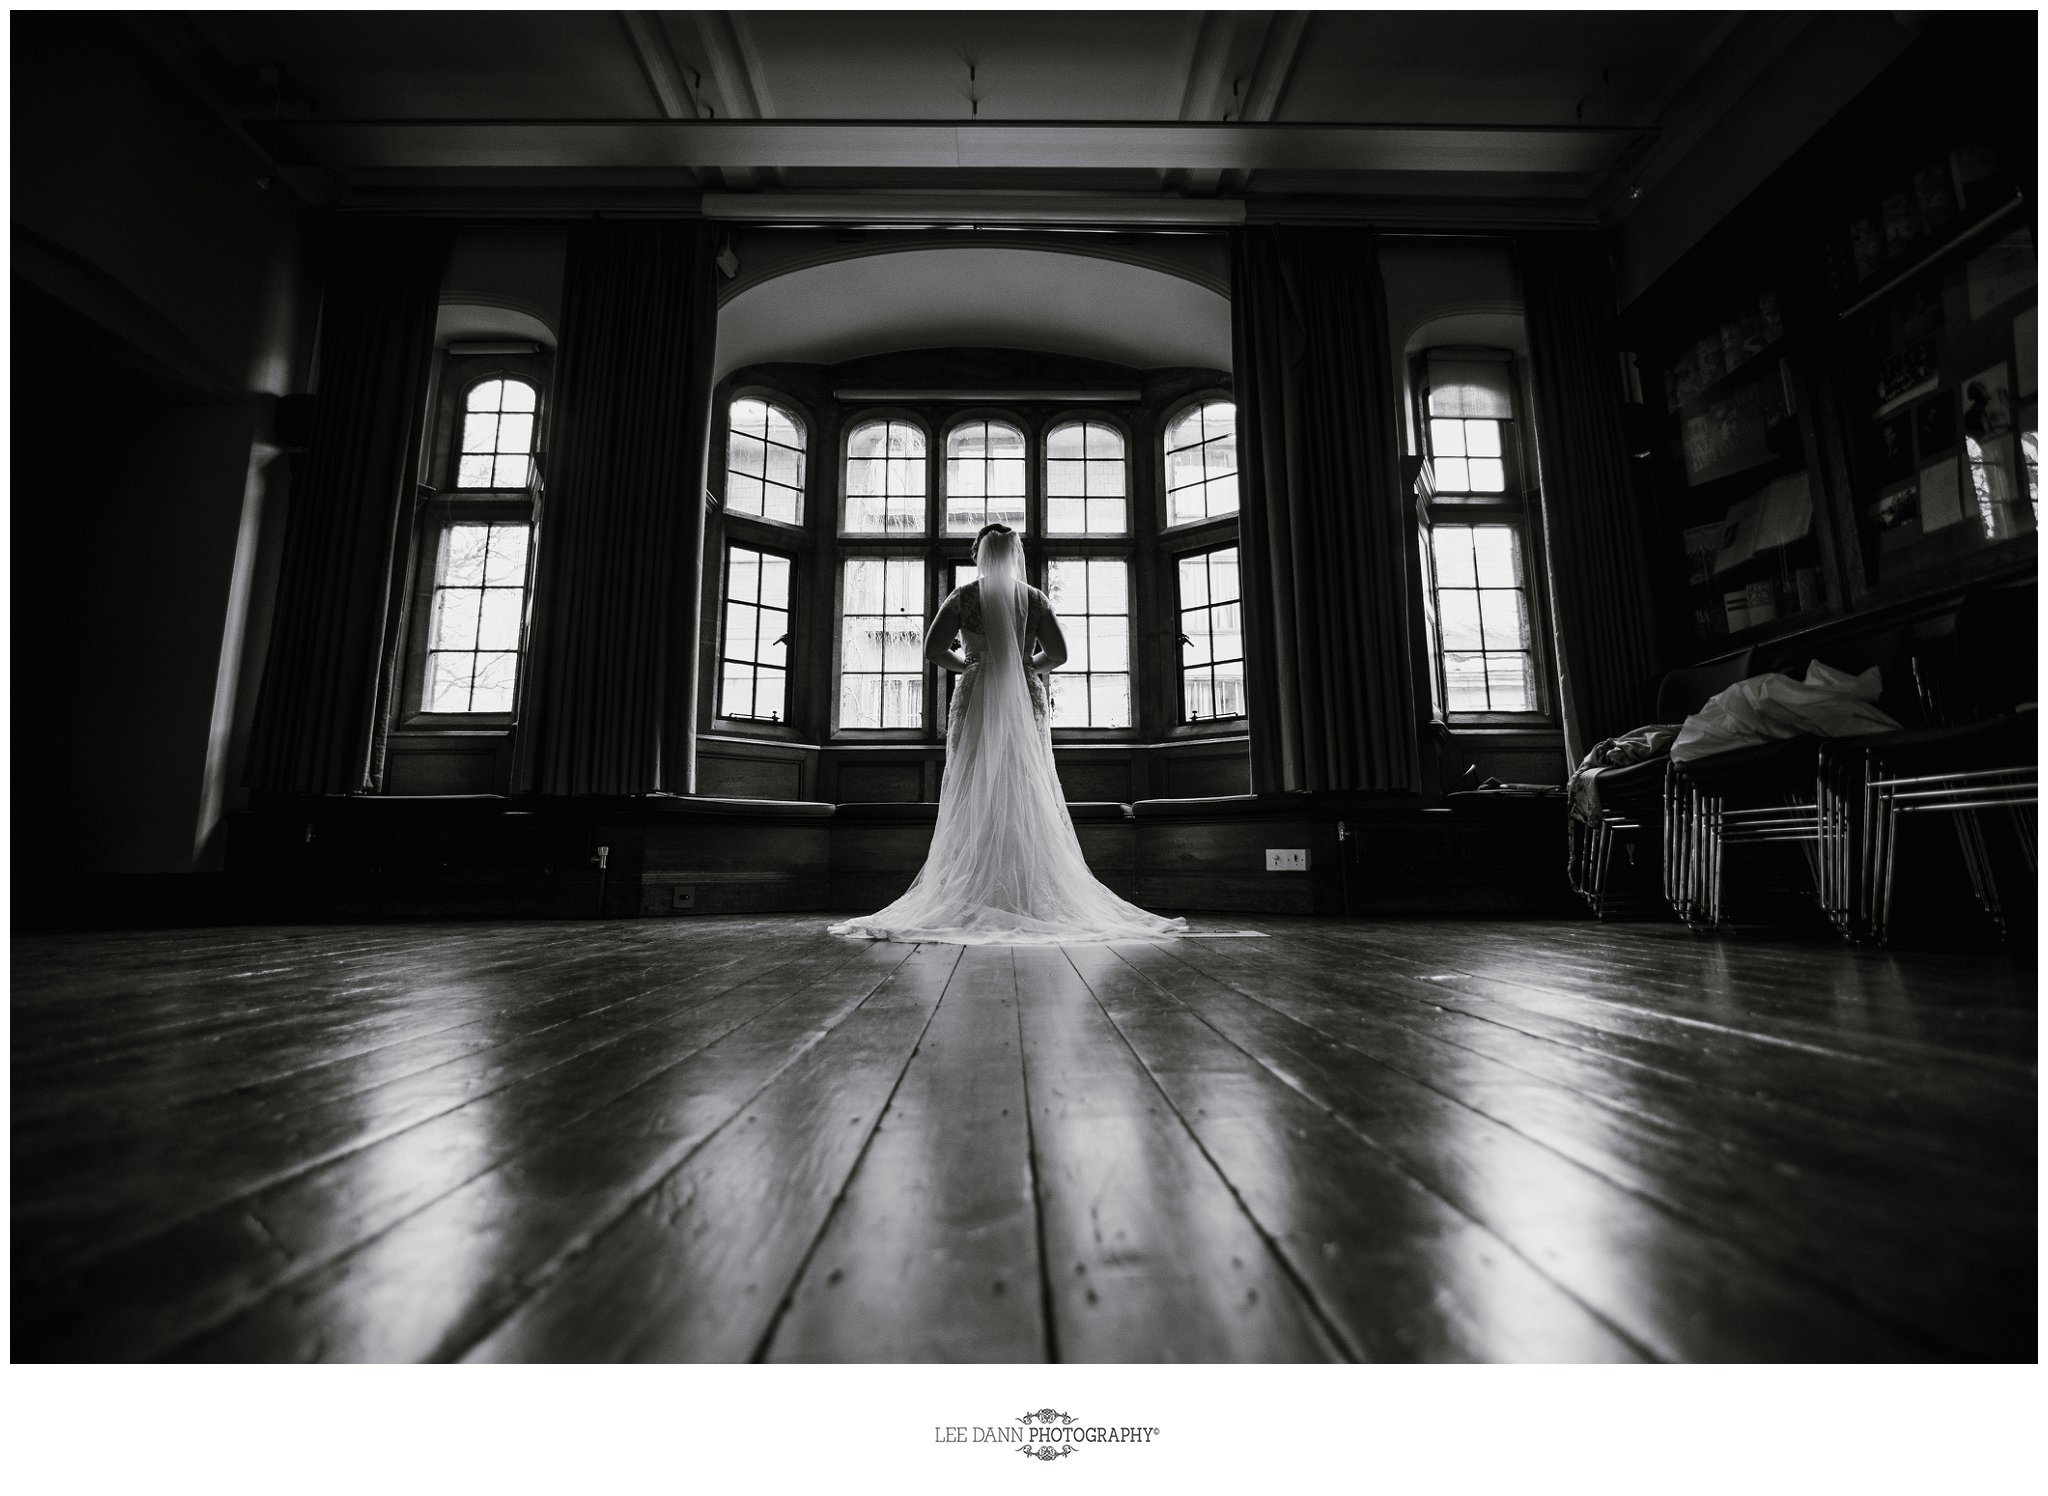 Kathryn&Christopherwedding-TrinityCollege-1stApril2017-1244